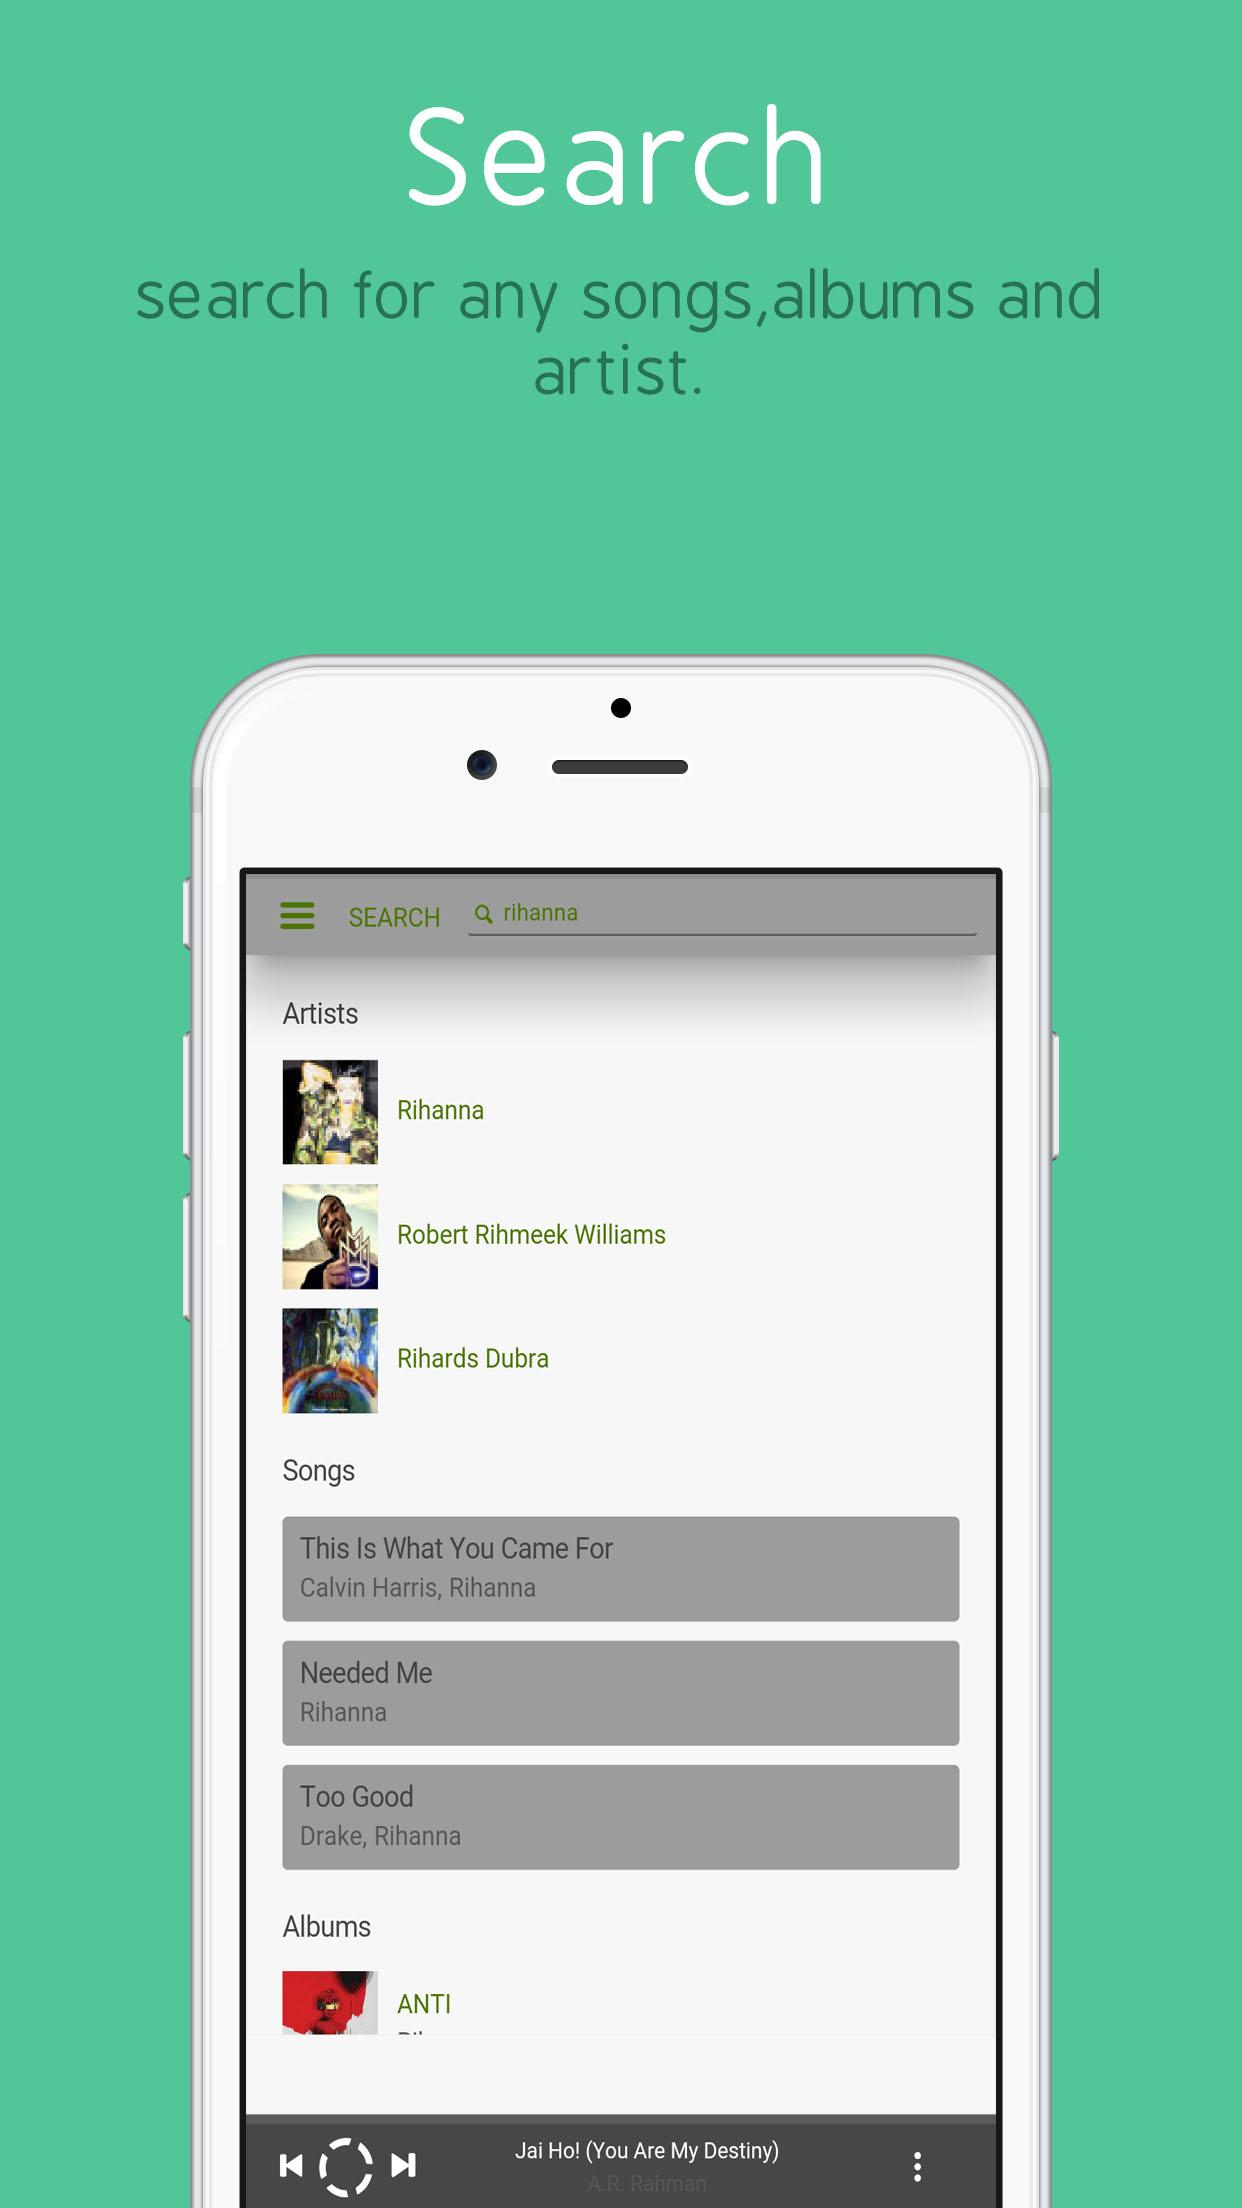 android application for bemusic codecanyon item for sale untitled 1 untitled 3 untitled 4 untitled 5